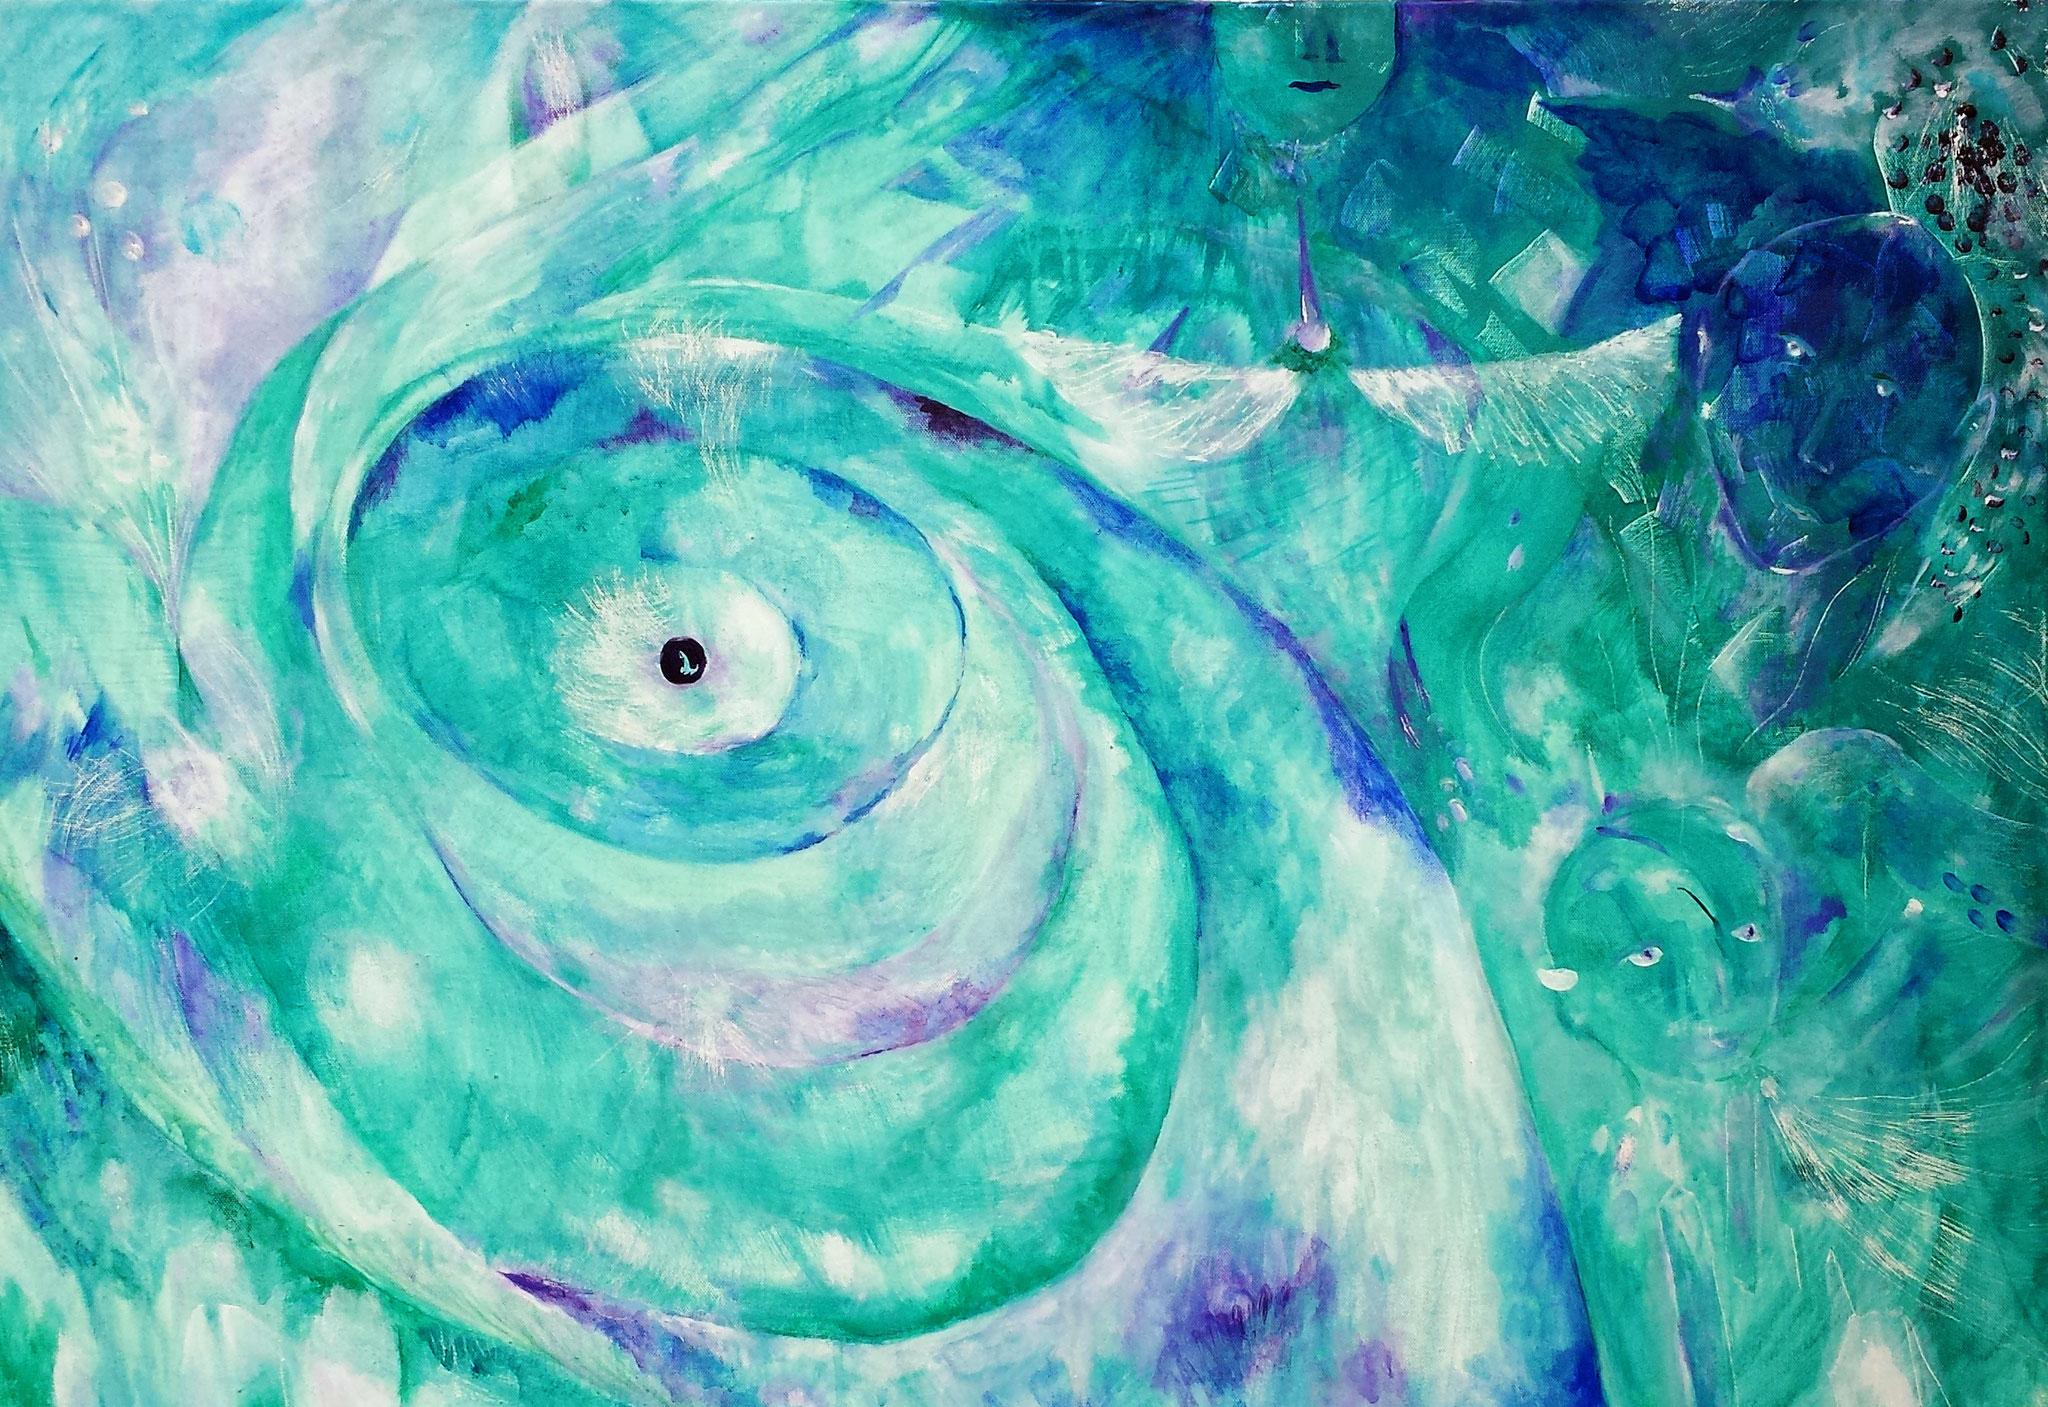 """Im Auge des Orkans"" 100 x 70 x 4, Acryl auf Leinwand"